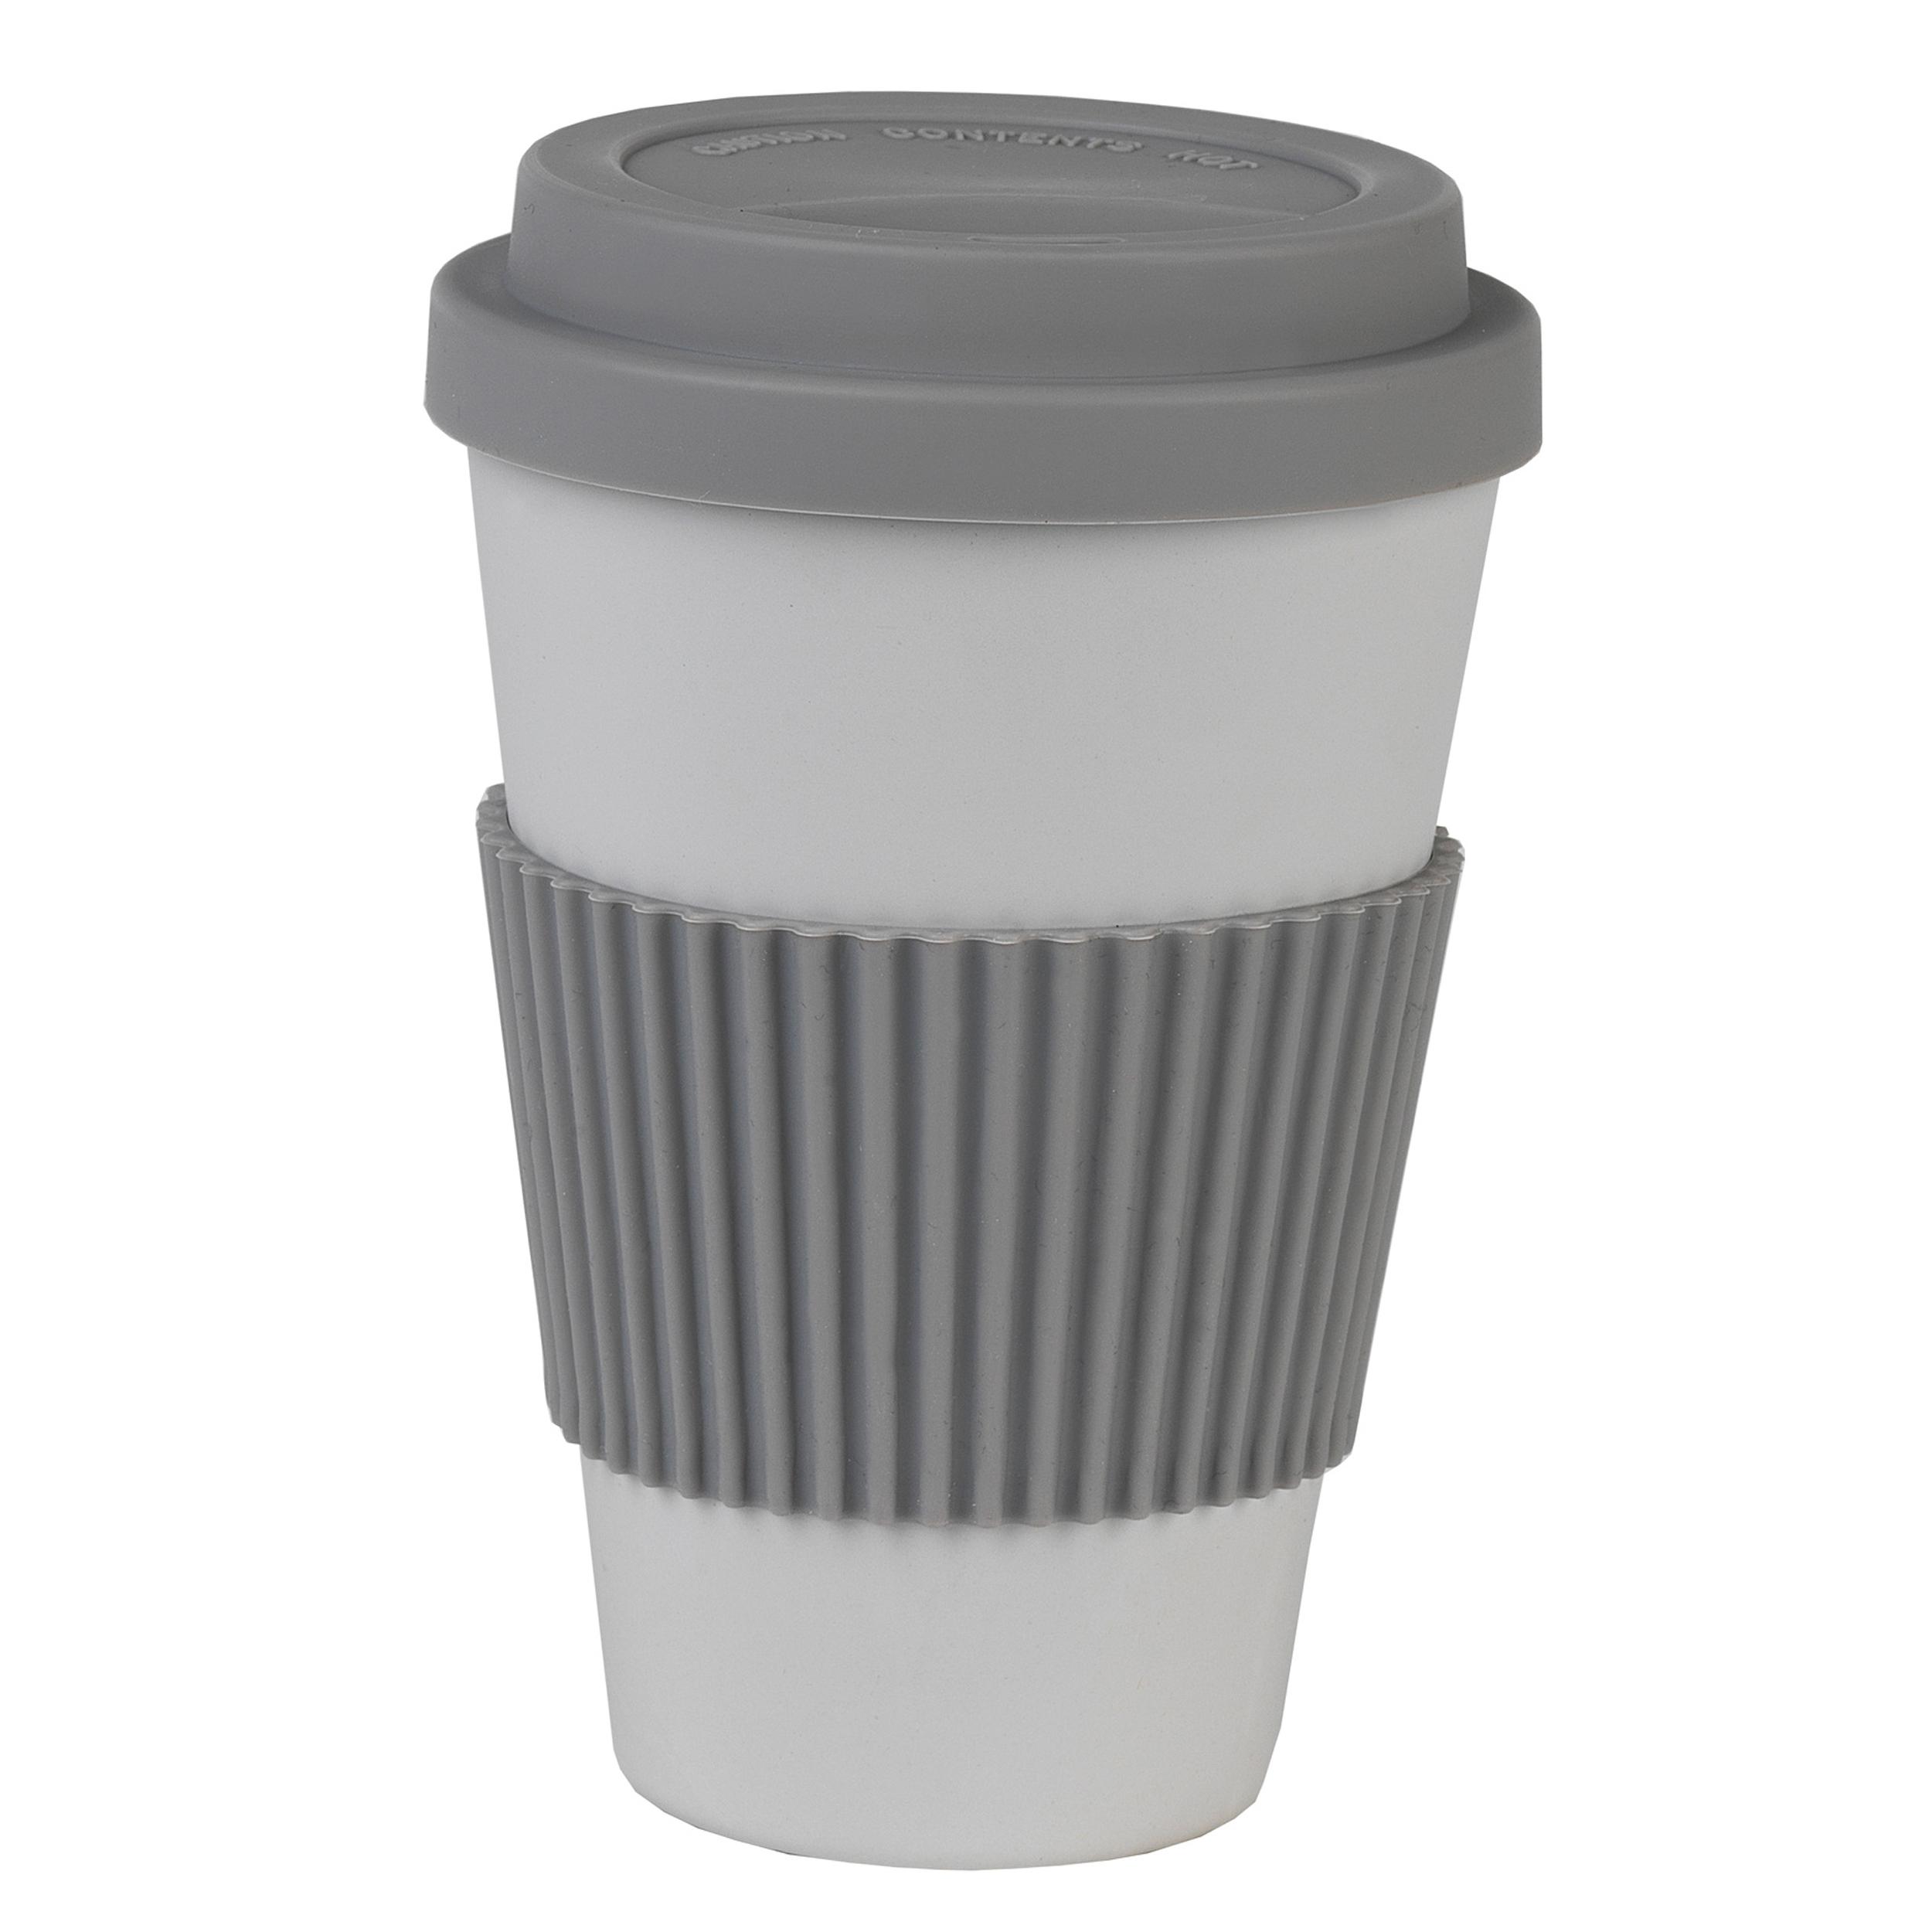 Salter BW08396G Earth 16 oz Lightweight Reusable Coffee Cup Travel Mug, Grey   Alternative to Single Use Plastic Cups